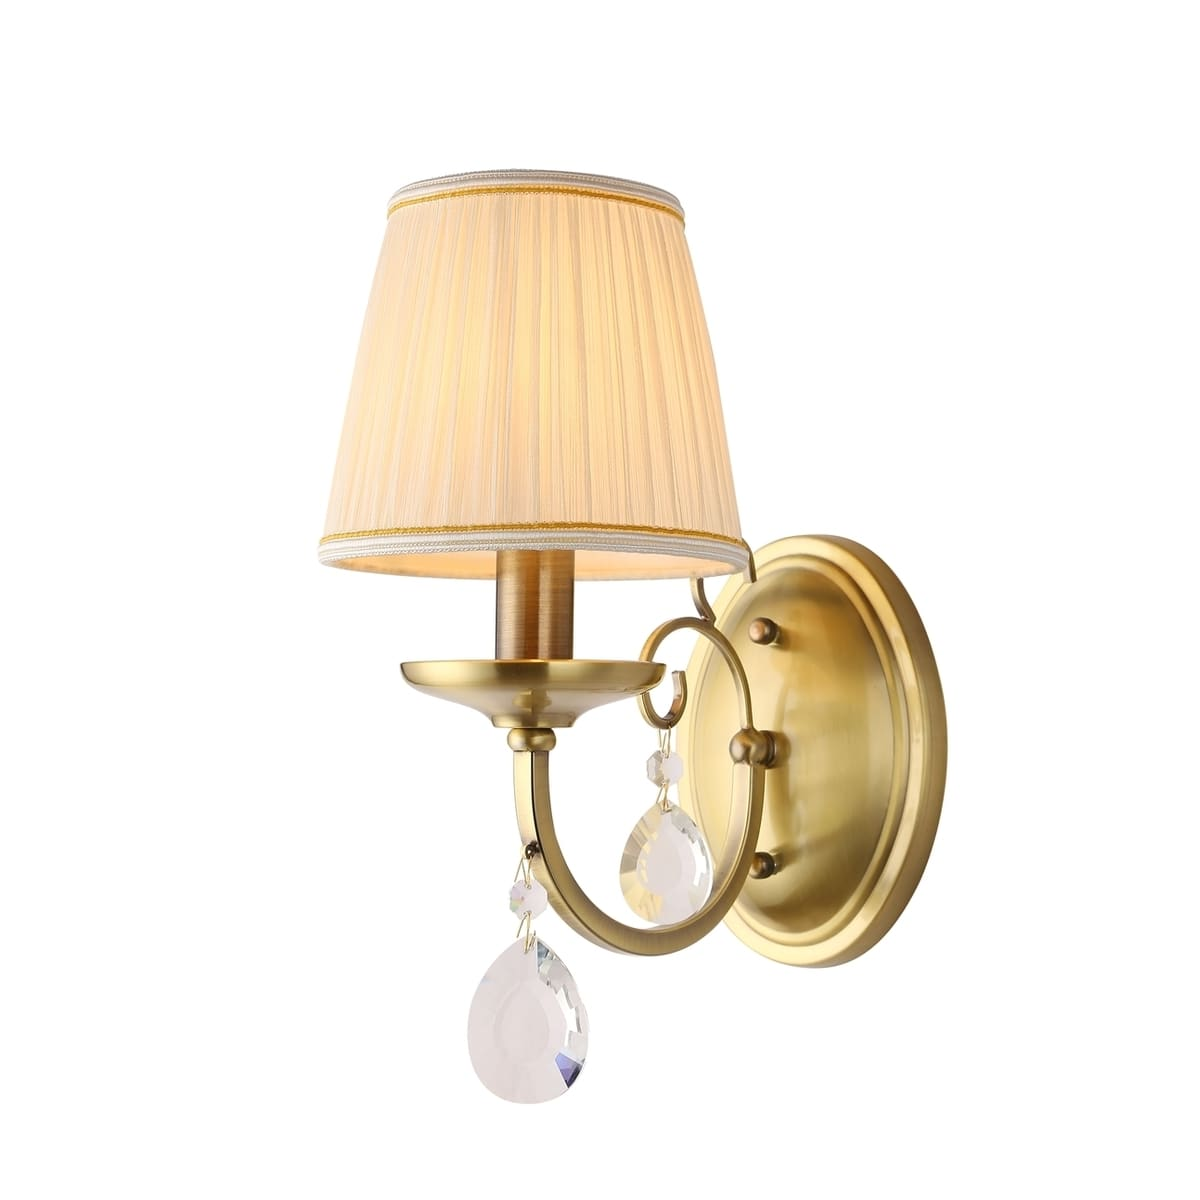 Настенный светильник Rivoli Б0038469 1 лампа цвет бежевый